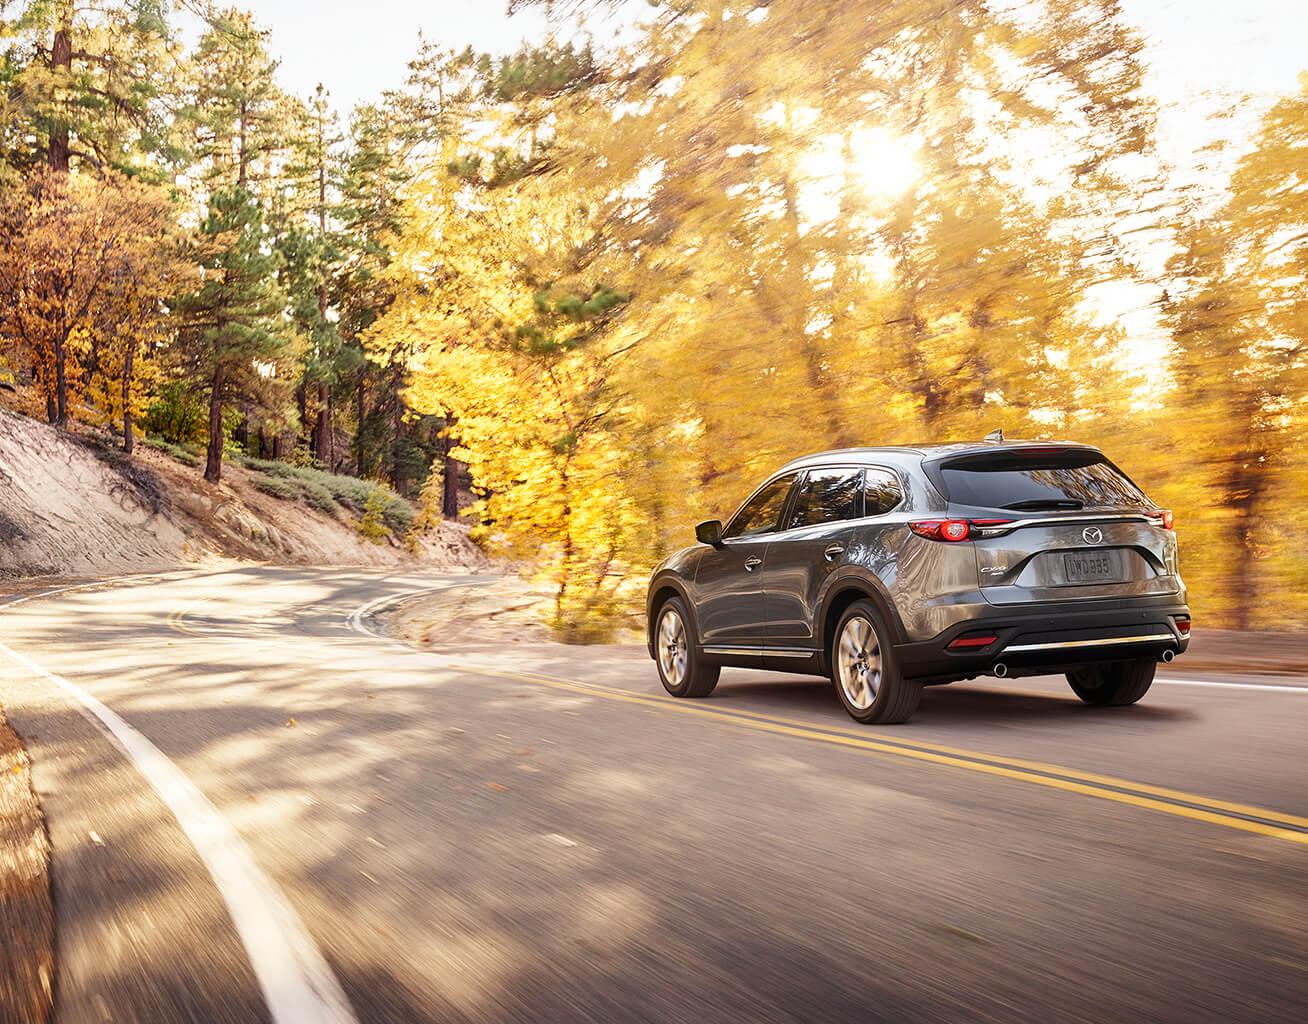 2016 Mazda CX 9 7 Passenger SUV 3 Row Family Car